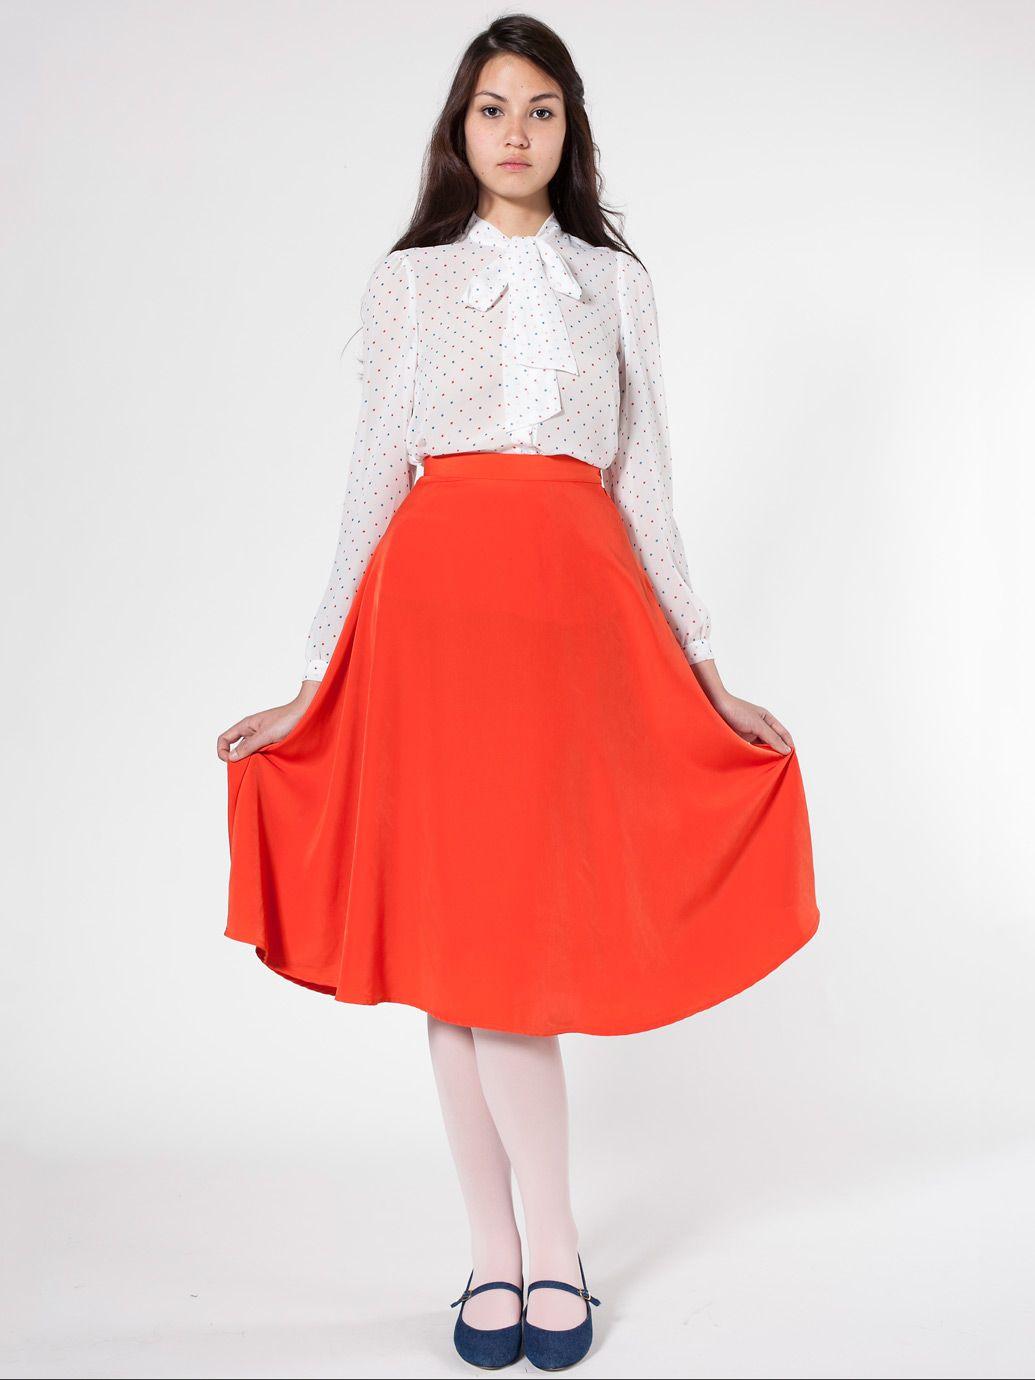 cfa4bf5fb American Apparel - Mid-Length Circle Skirt   Miscellaneous ...